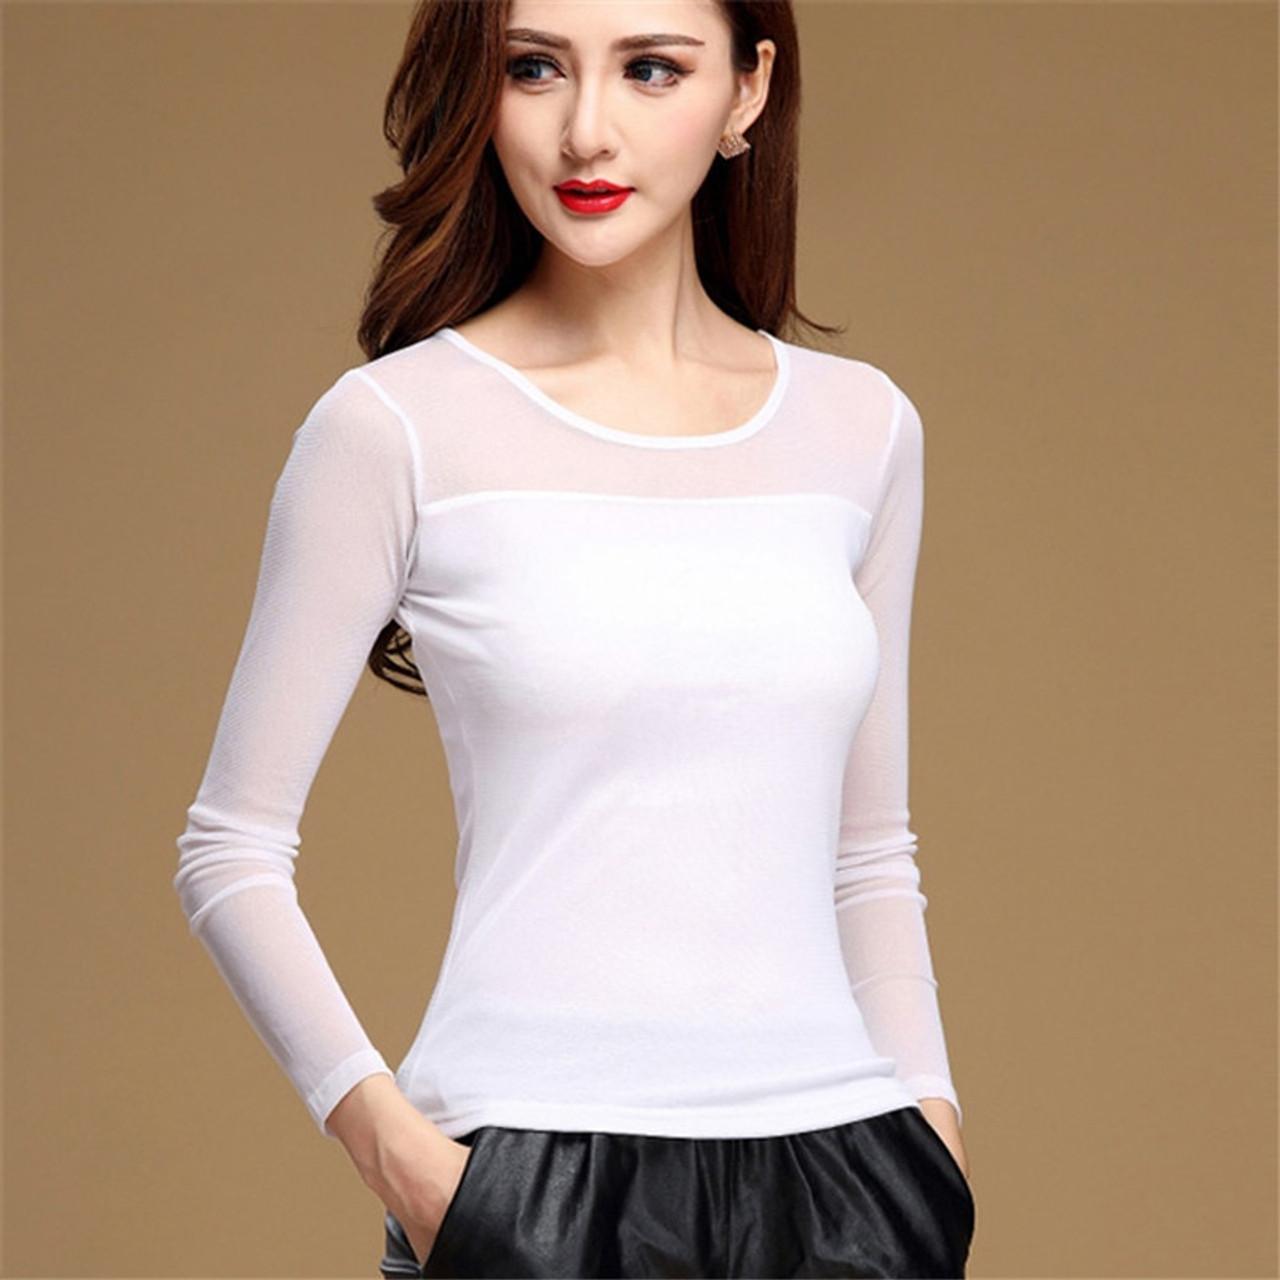 ... New Women Blouse Shirt Black White Sexy Long Shirt Casual Long Sleeve  Lace Blouse Under Shirts ... f49e3d658f0c